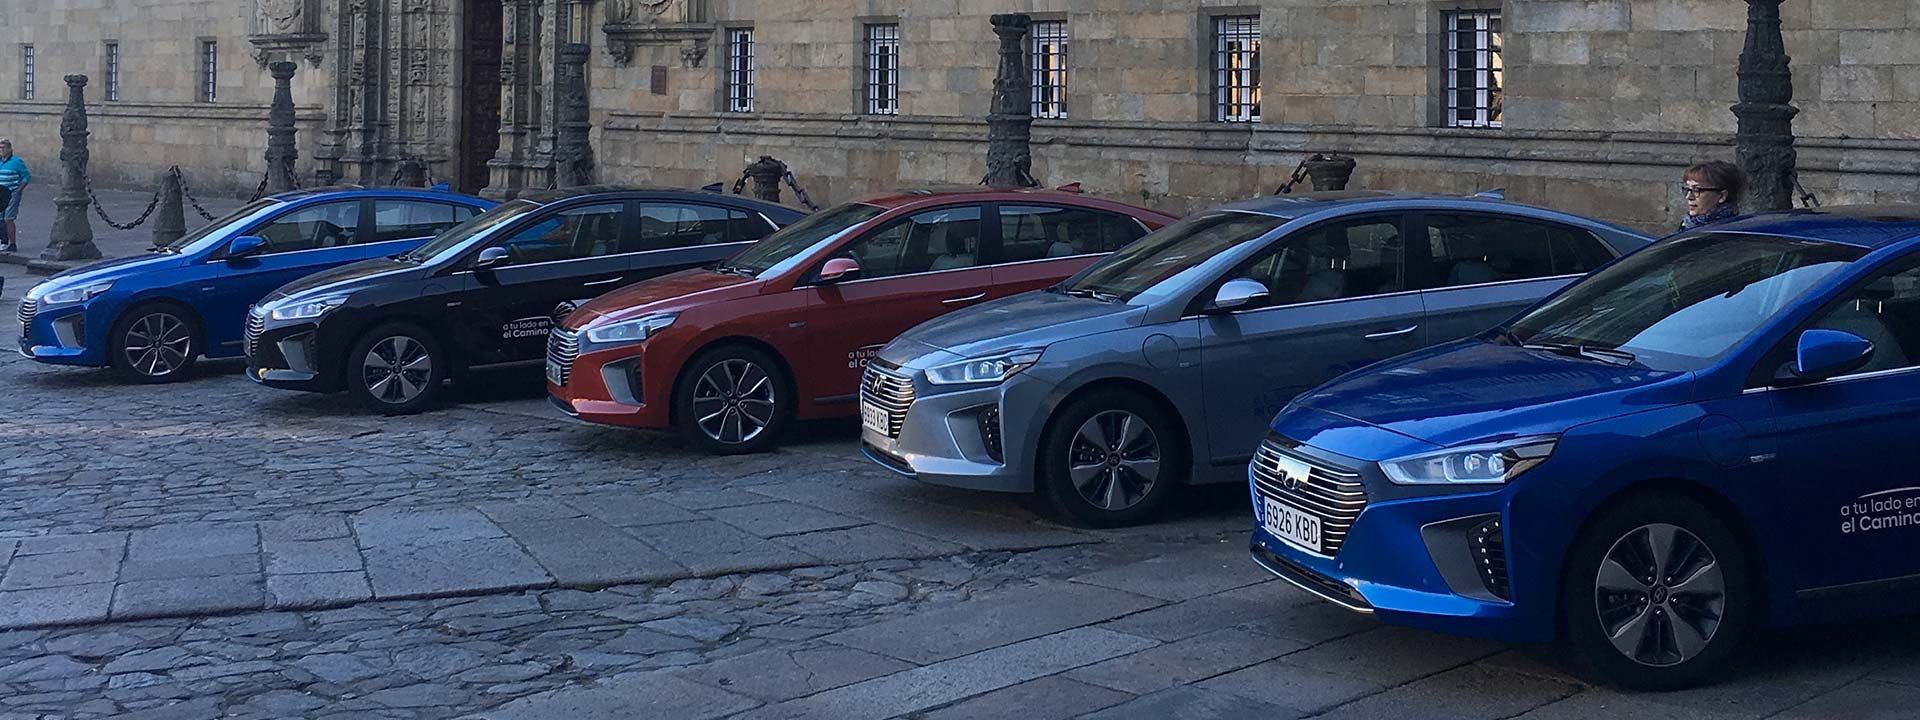 Hyundai Motor España lanza la campaña social #ATuLadoEnElCamino